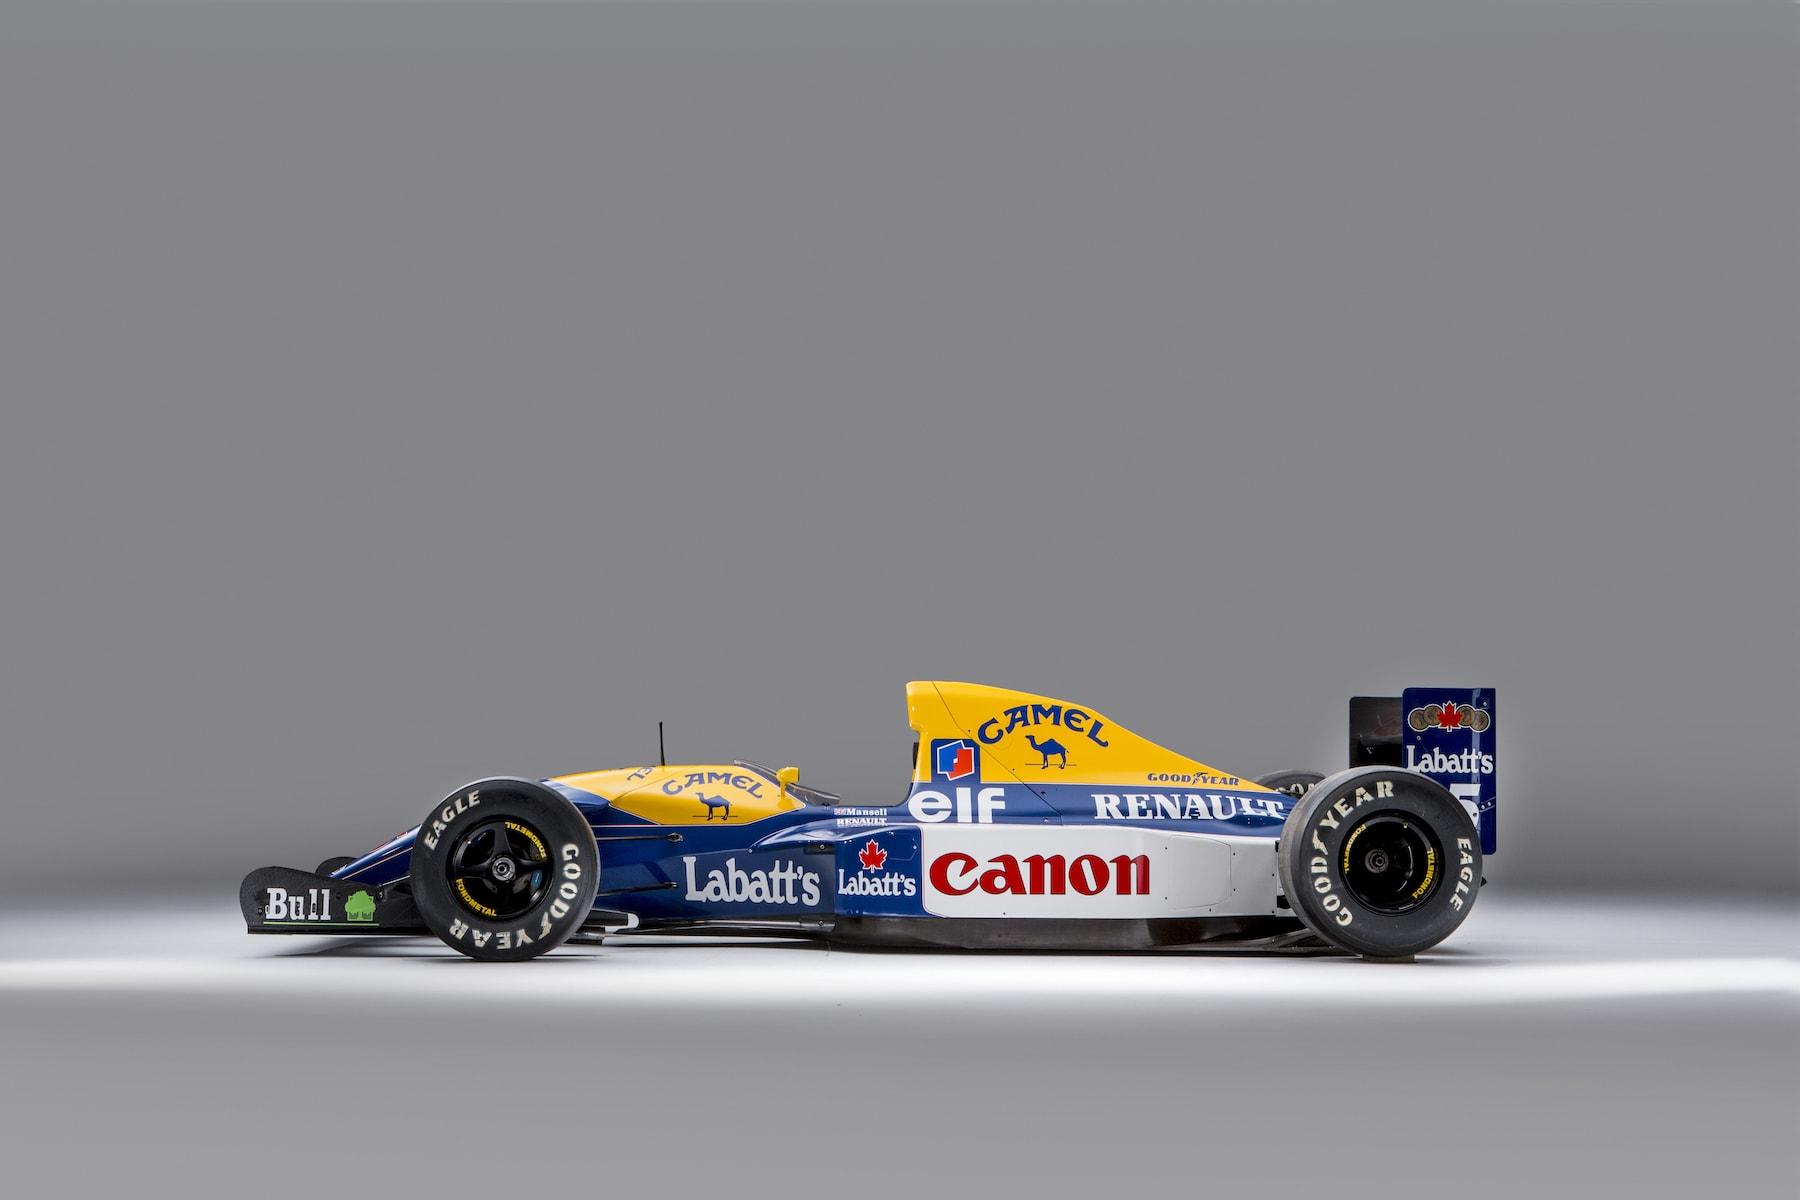 1992 Williams FW14B at Bonhams 2019 FoS 1 copy.jpg